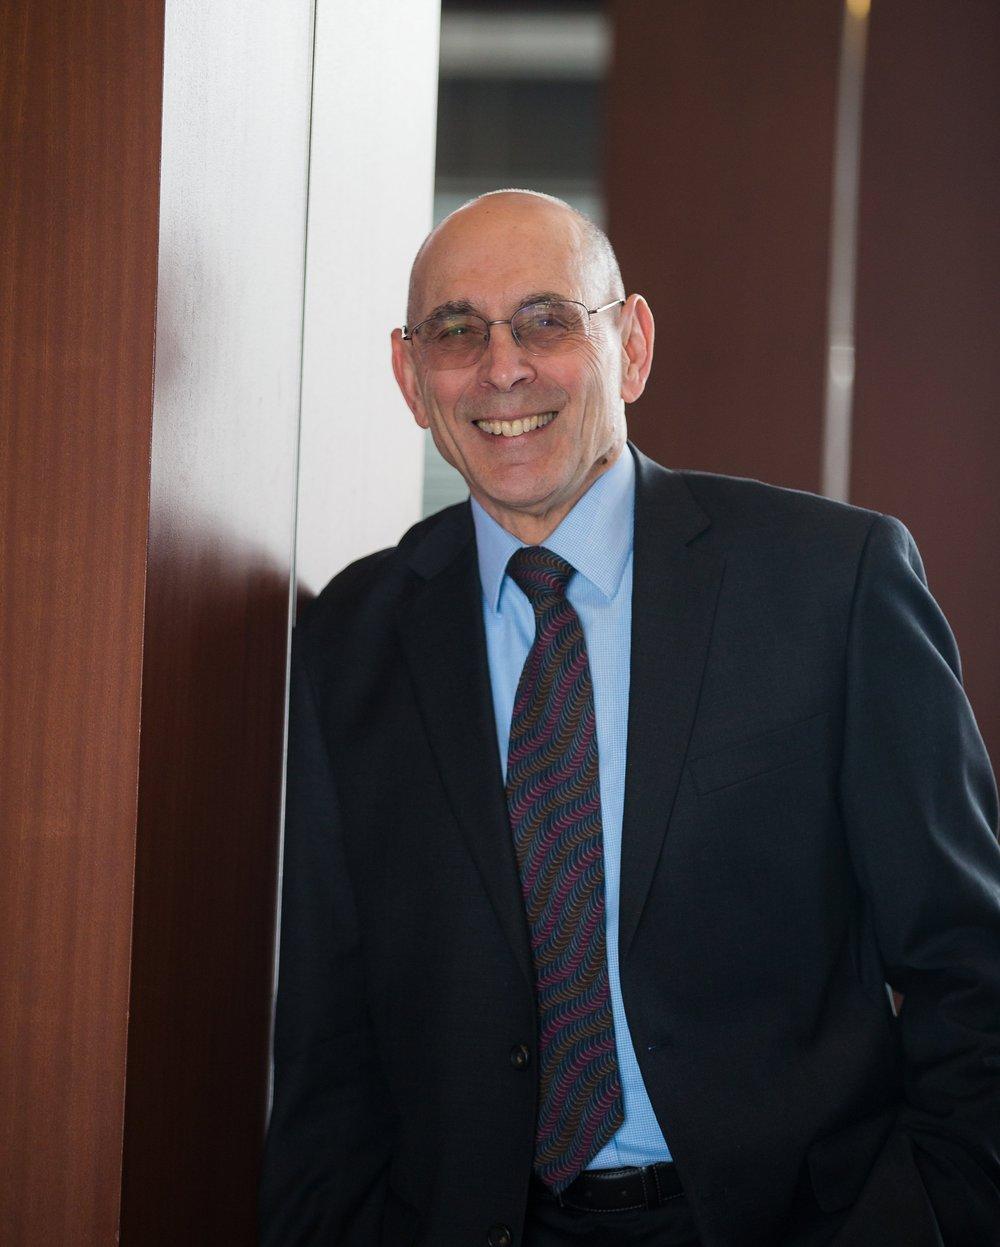 Ray Rund - Managing Director